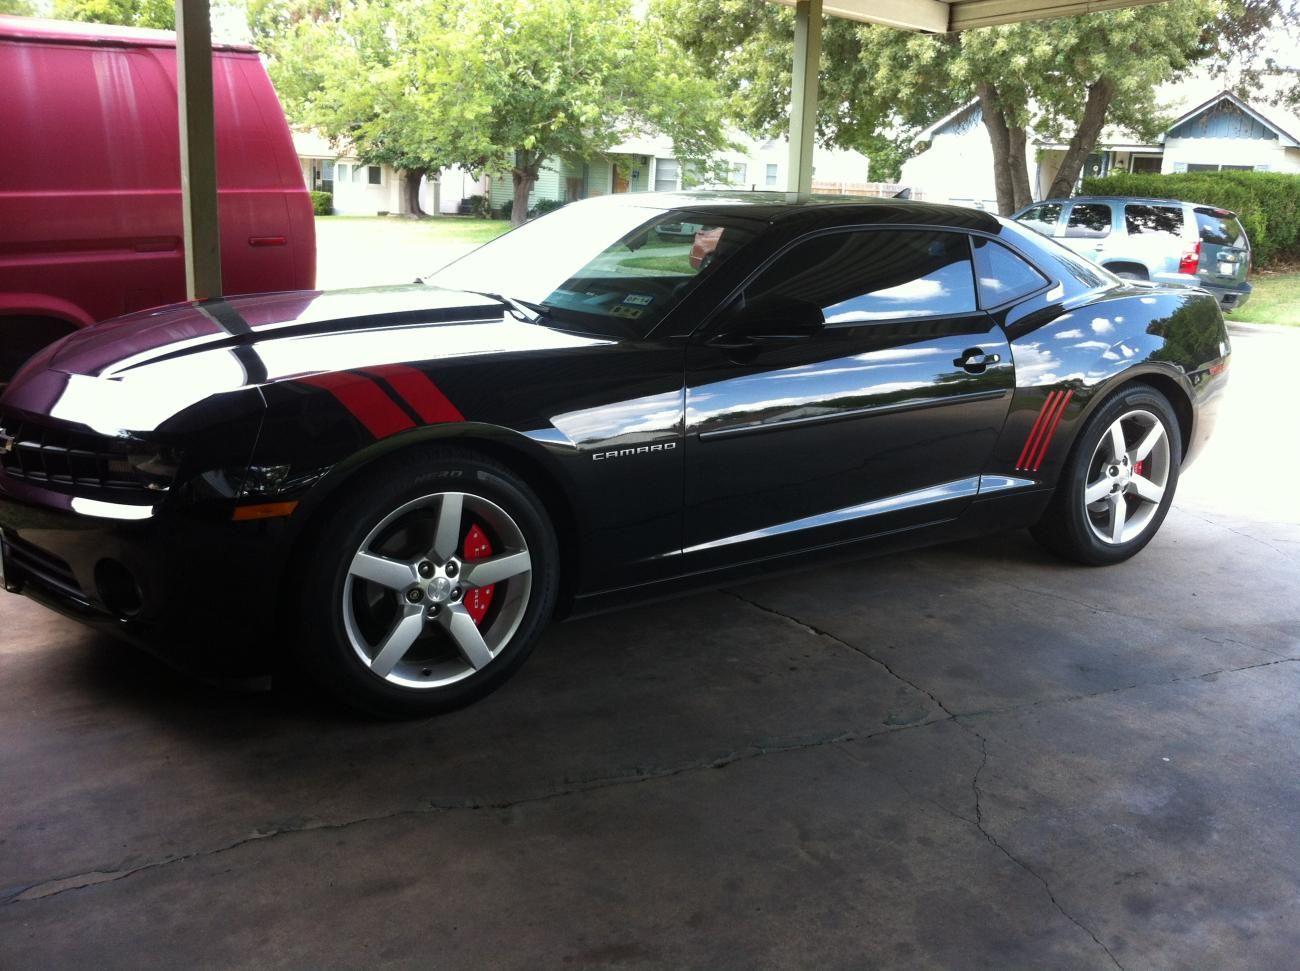 Camaro black and red chevy camaro : Added Hash stripes. Red on Black - Camaro5 Chevy Camaro Forum ...